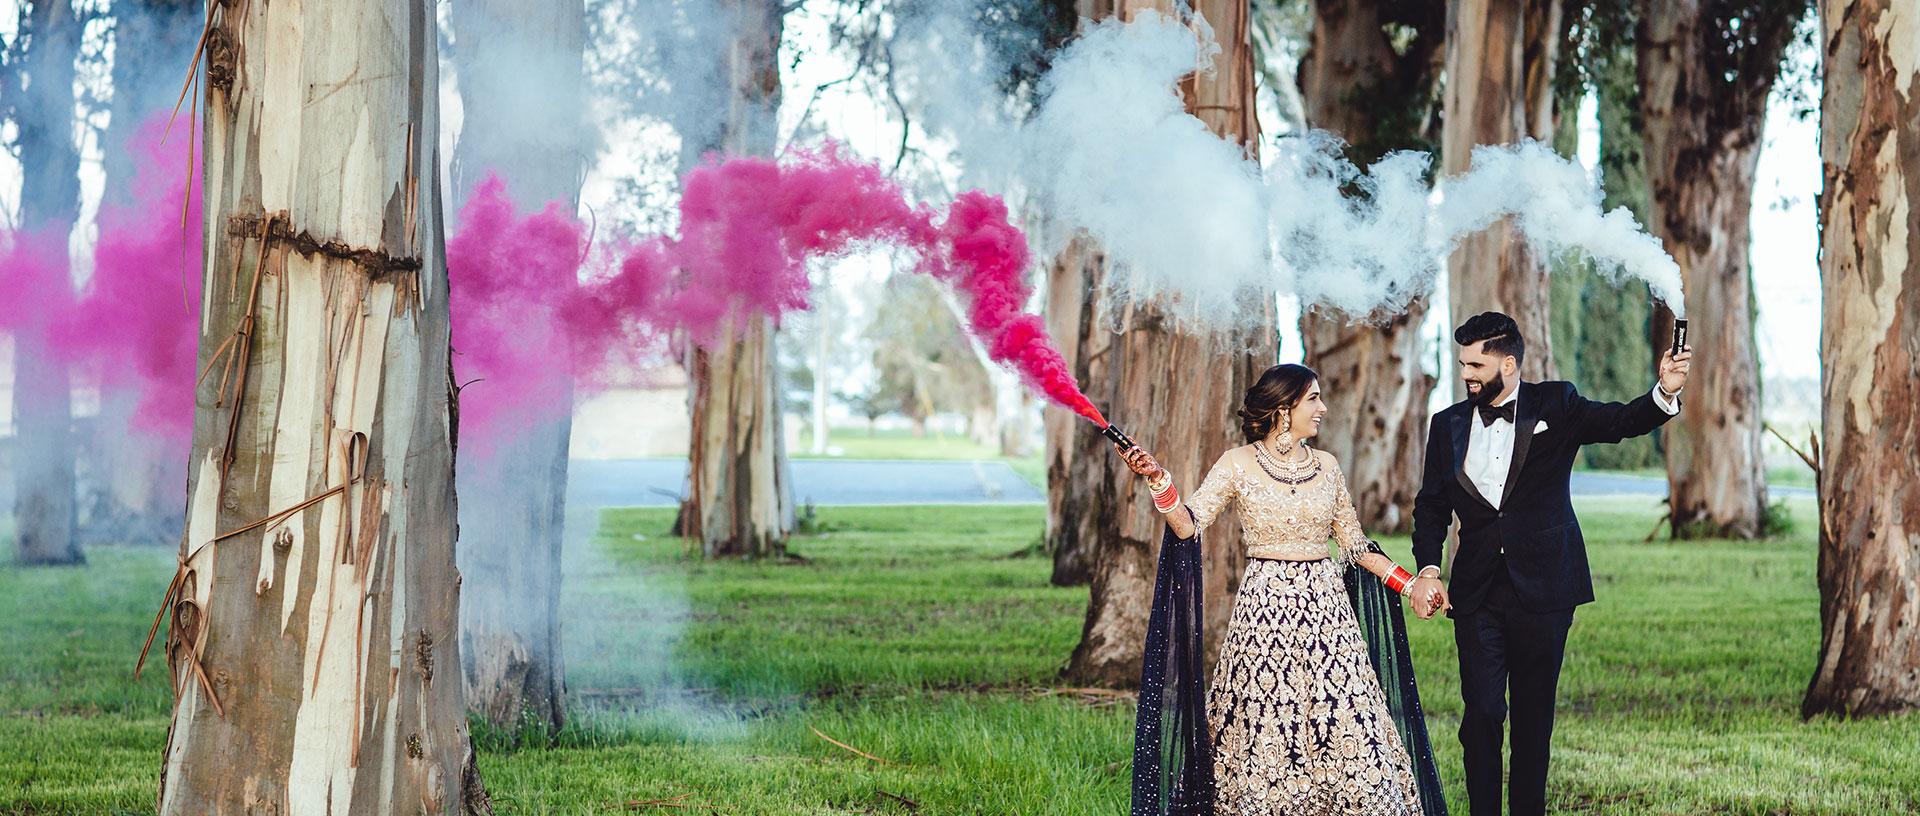 Smoke Bombs at an Indian Wedding in Sacramento, CA - Same Day Edit